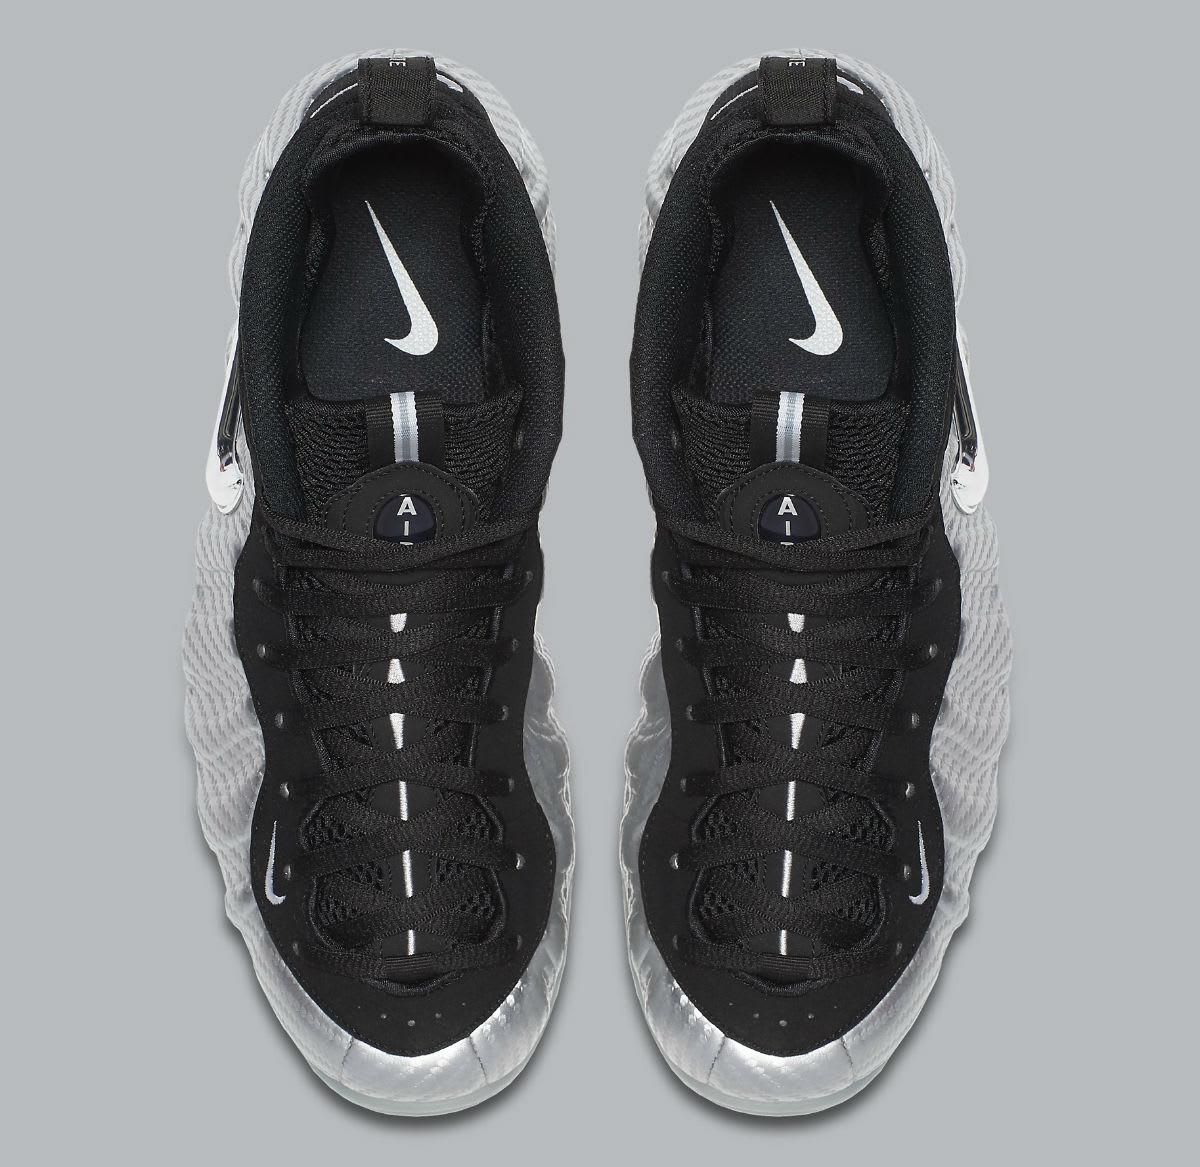 Nike Air Foamposite Pro Silver Surfer Release Date Top 616750-004